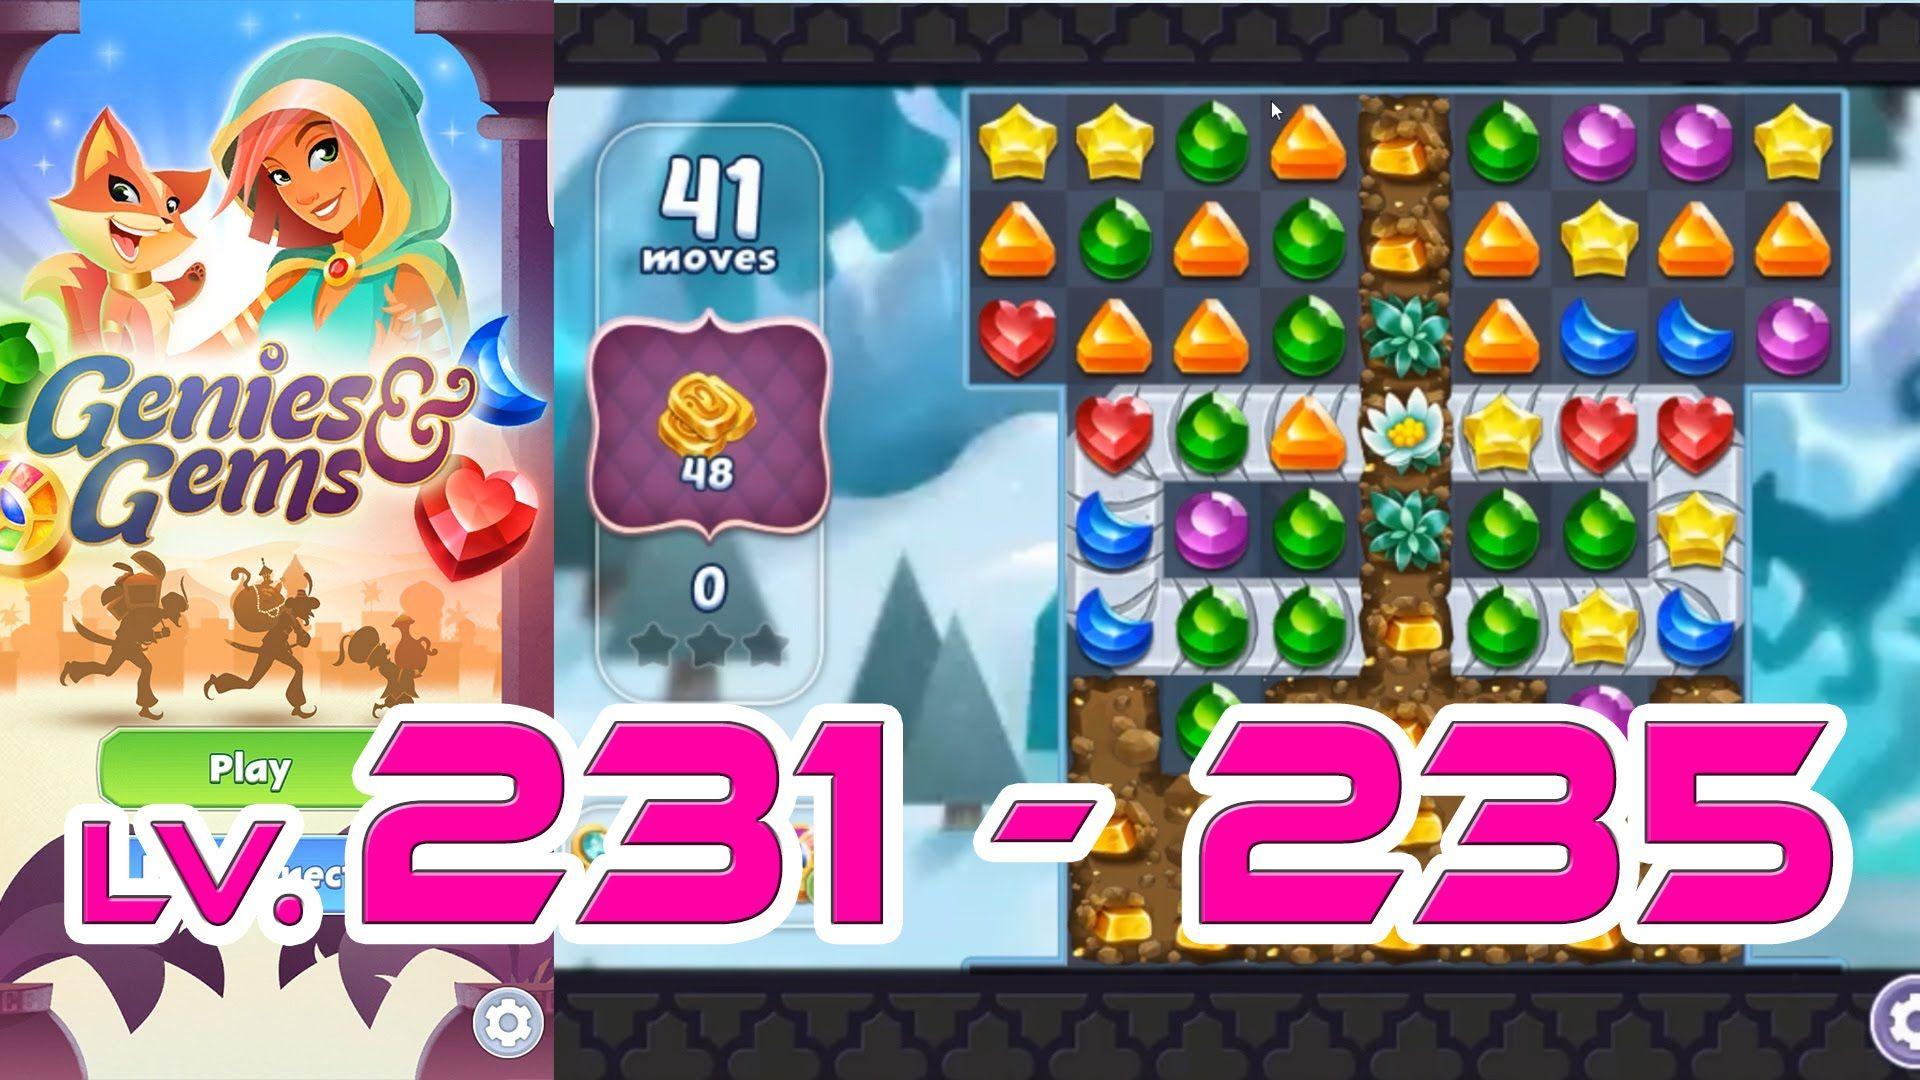 Genies & Gems - Level 231 - 235 (1080p/60fps) | Genies & Gems